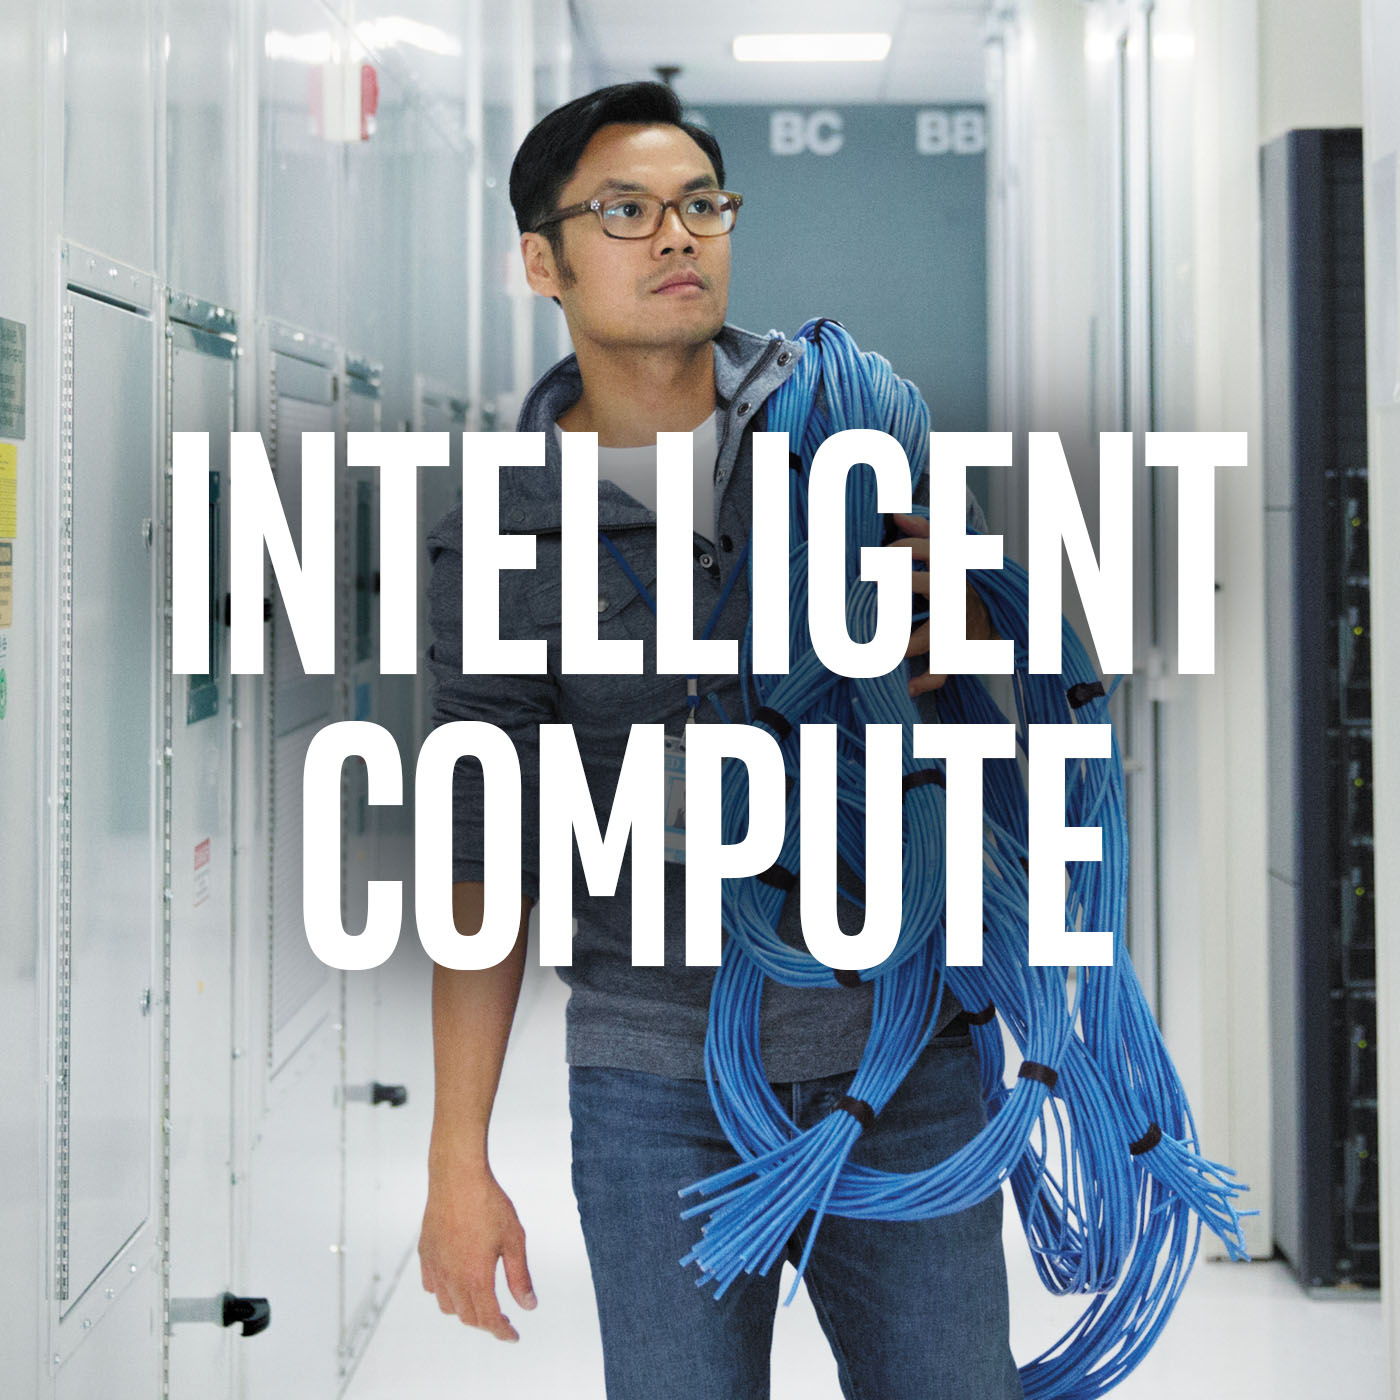 Intel: Intelligent Compute